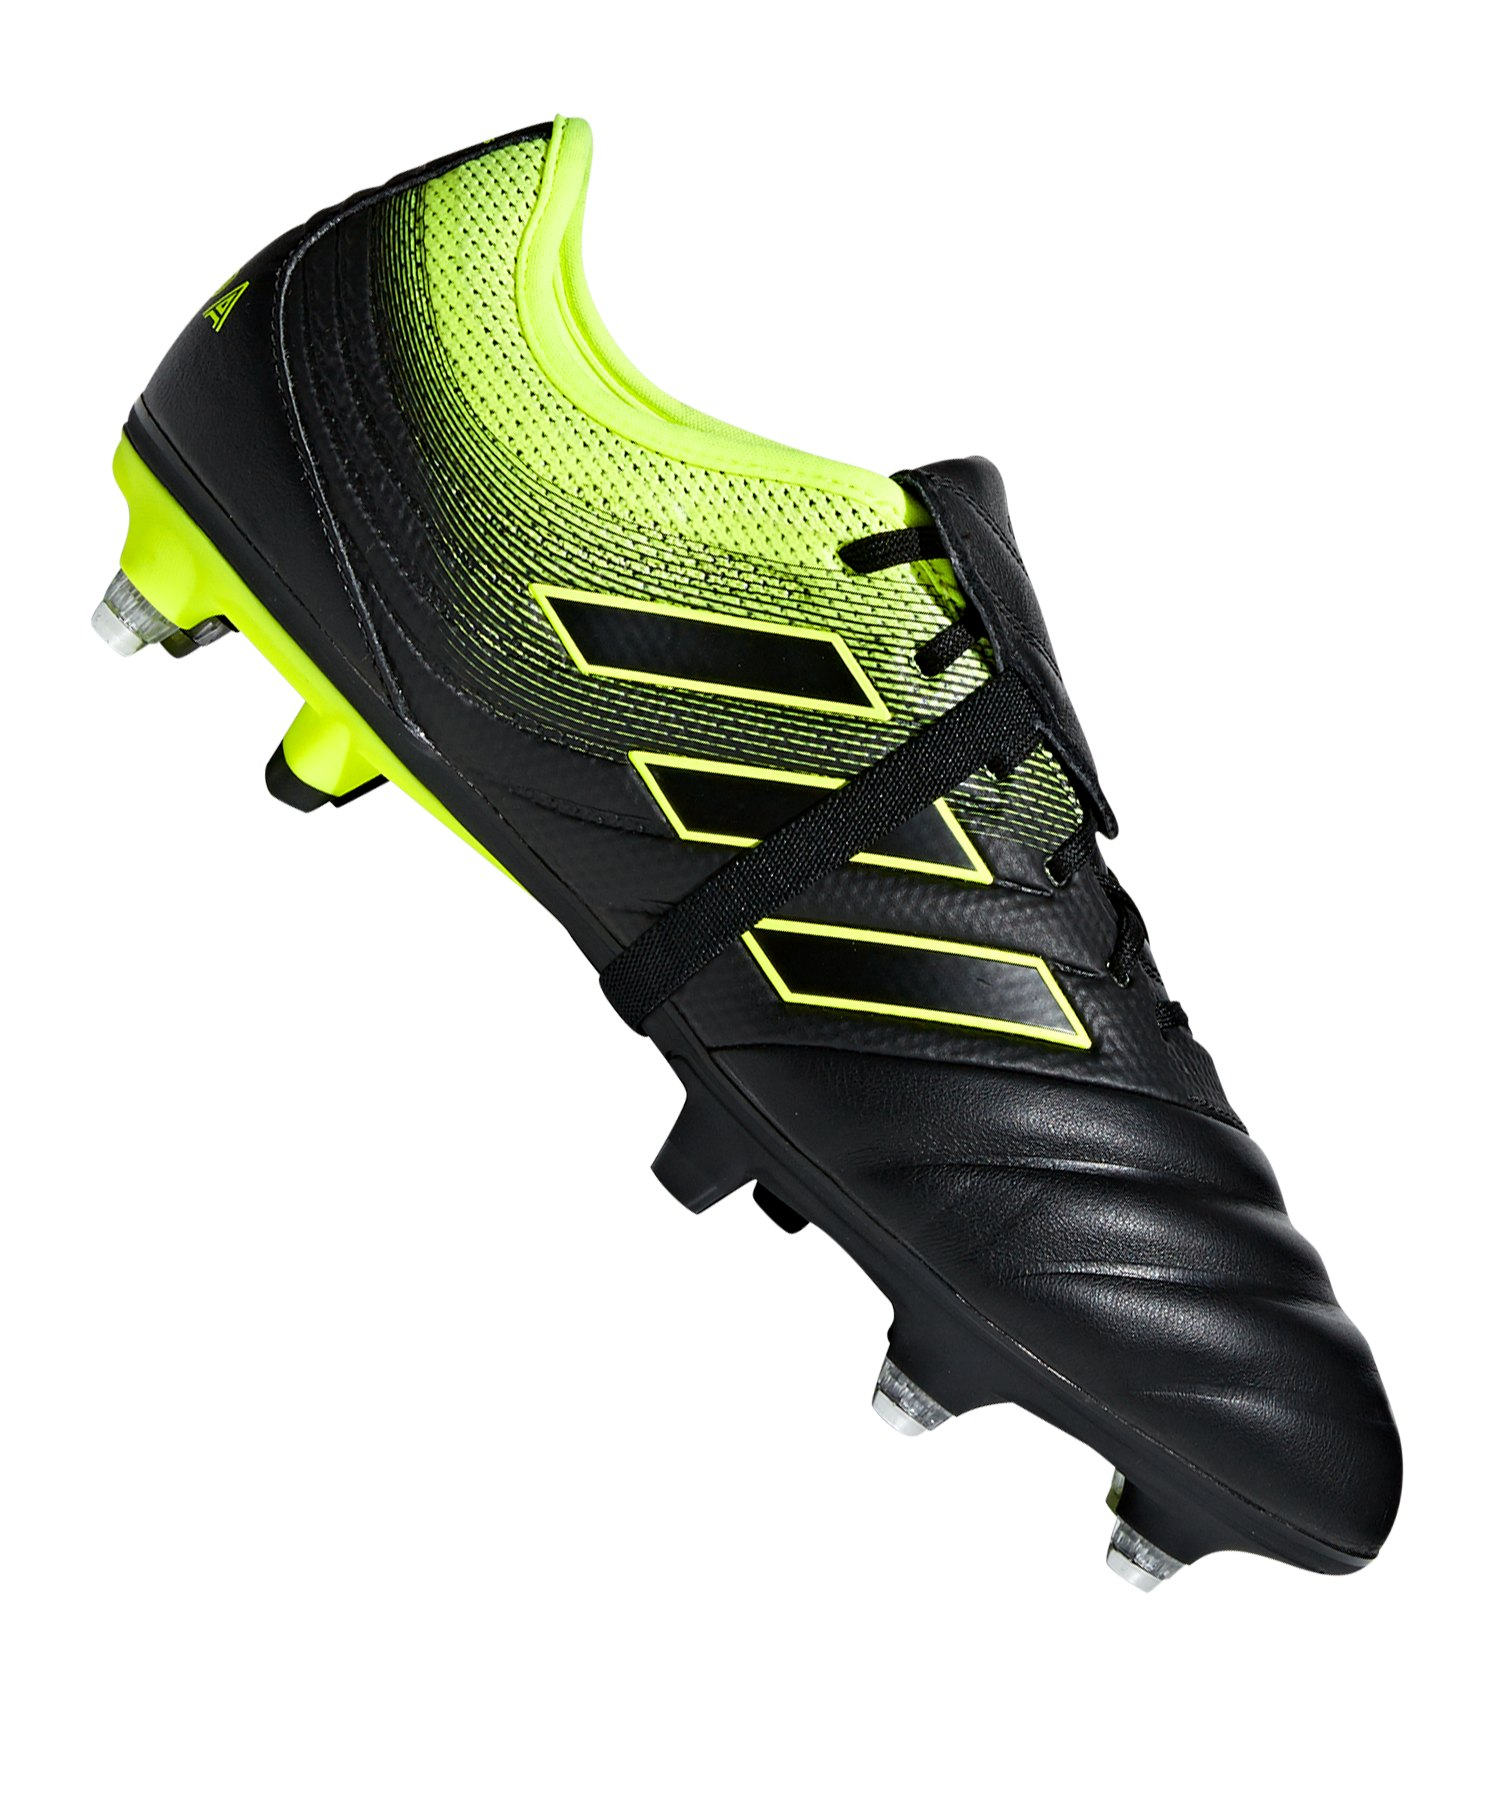 adidas COPA Gloro 19.2 SG Schwarz Gelb - schwarz